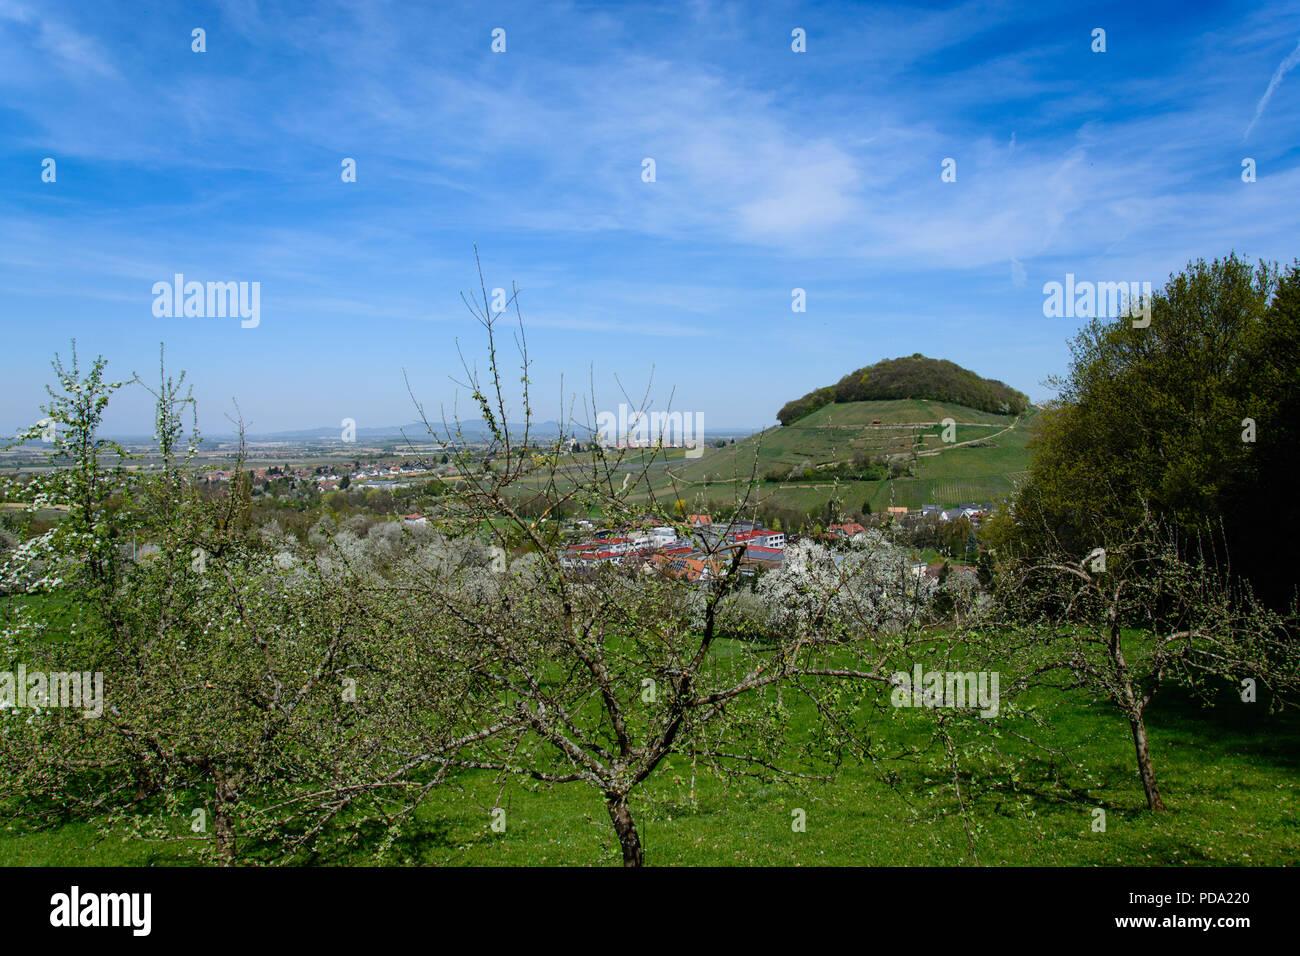 grüne Wiesen, blauer Himmel - Stock Image